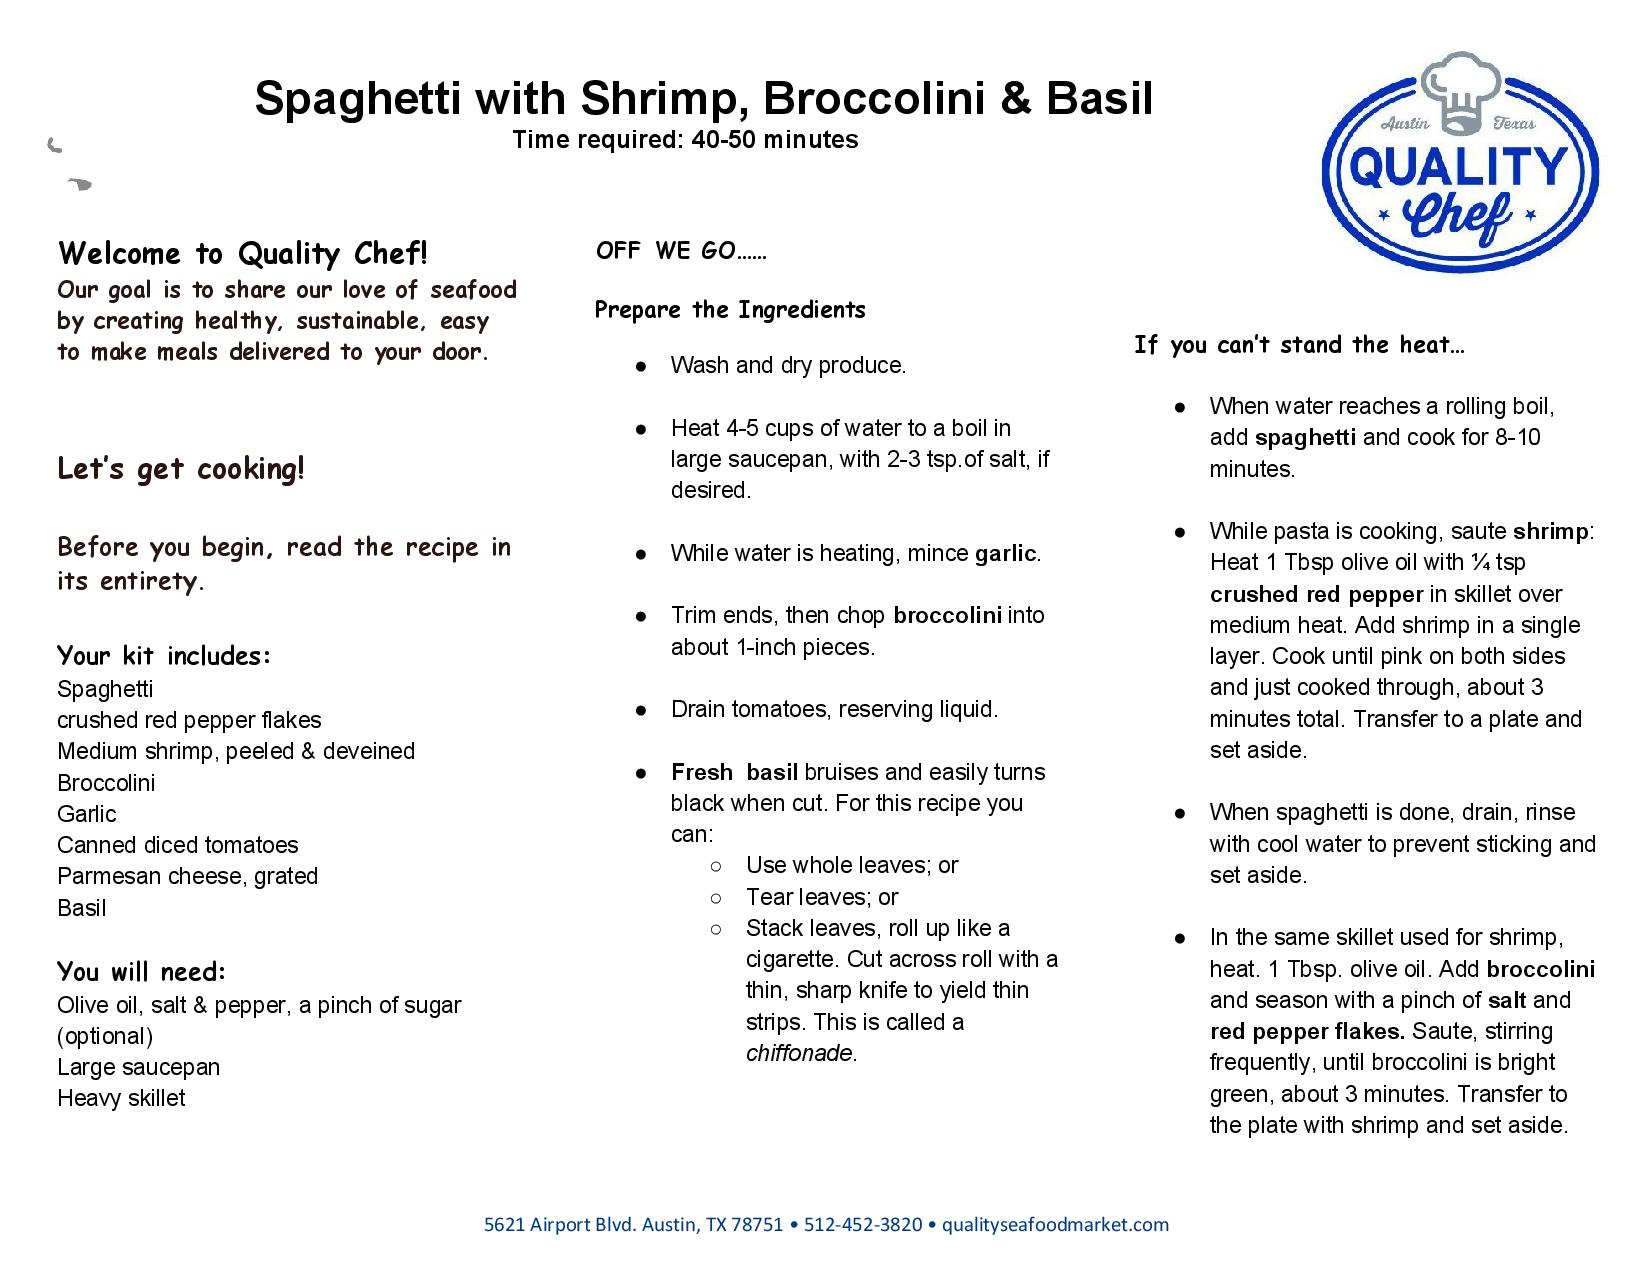 QC Spaghetti with Shrimp Broccolini  Basil-page-001 (2).jpg